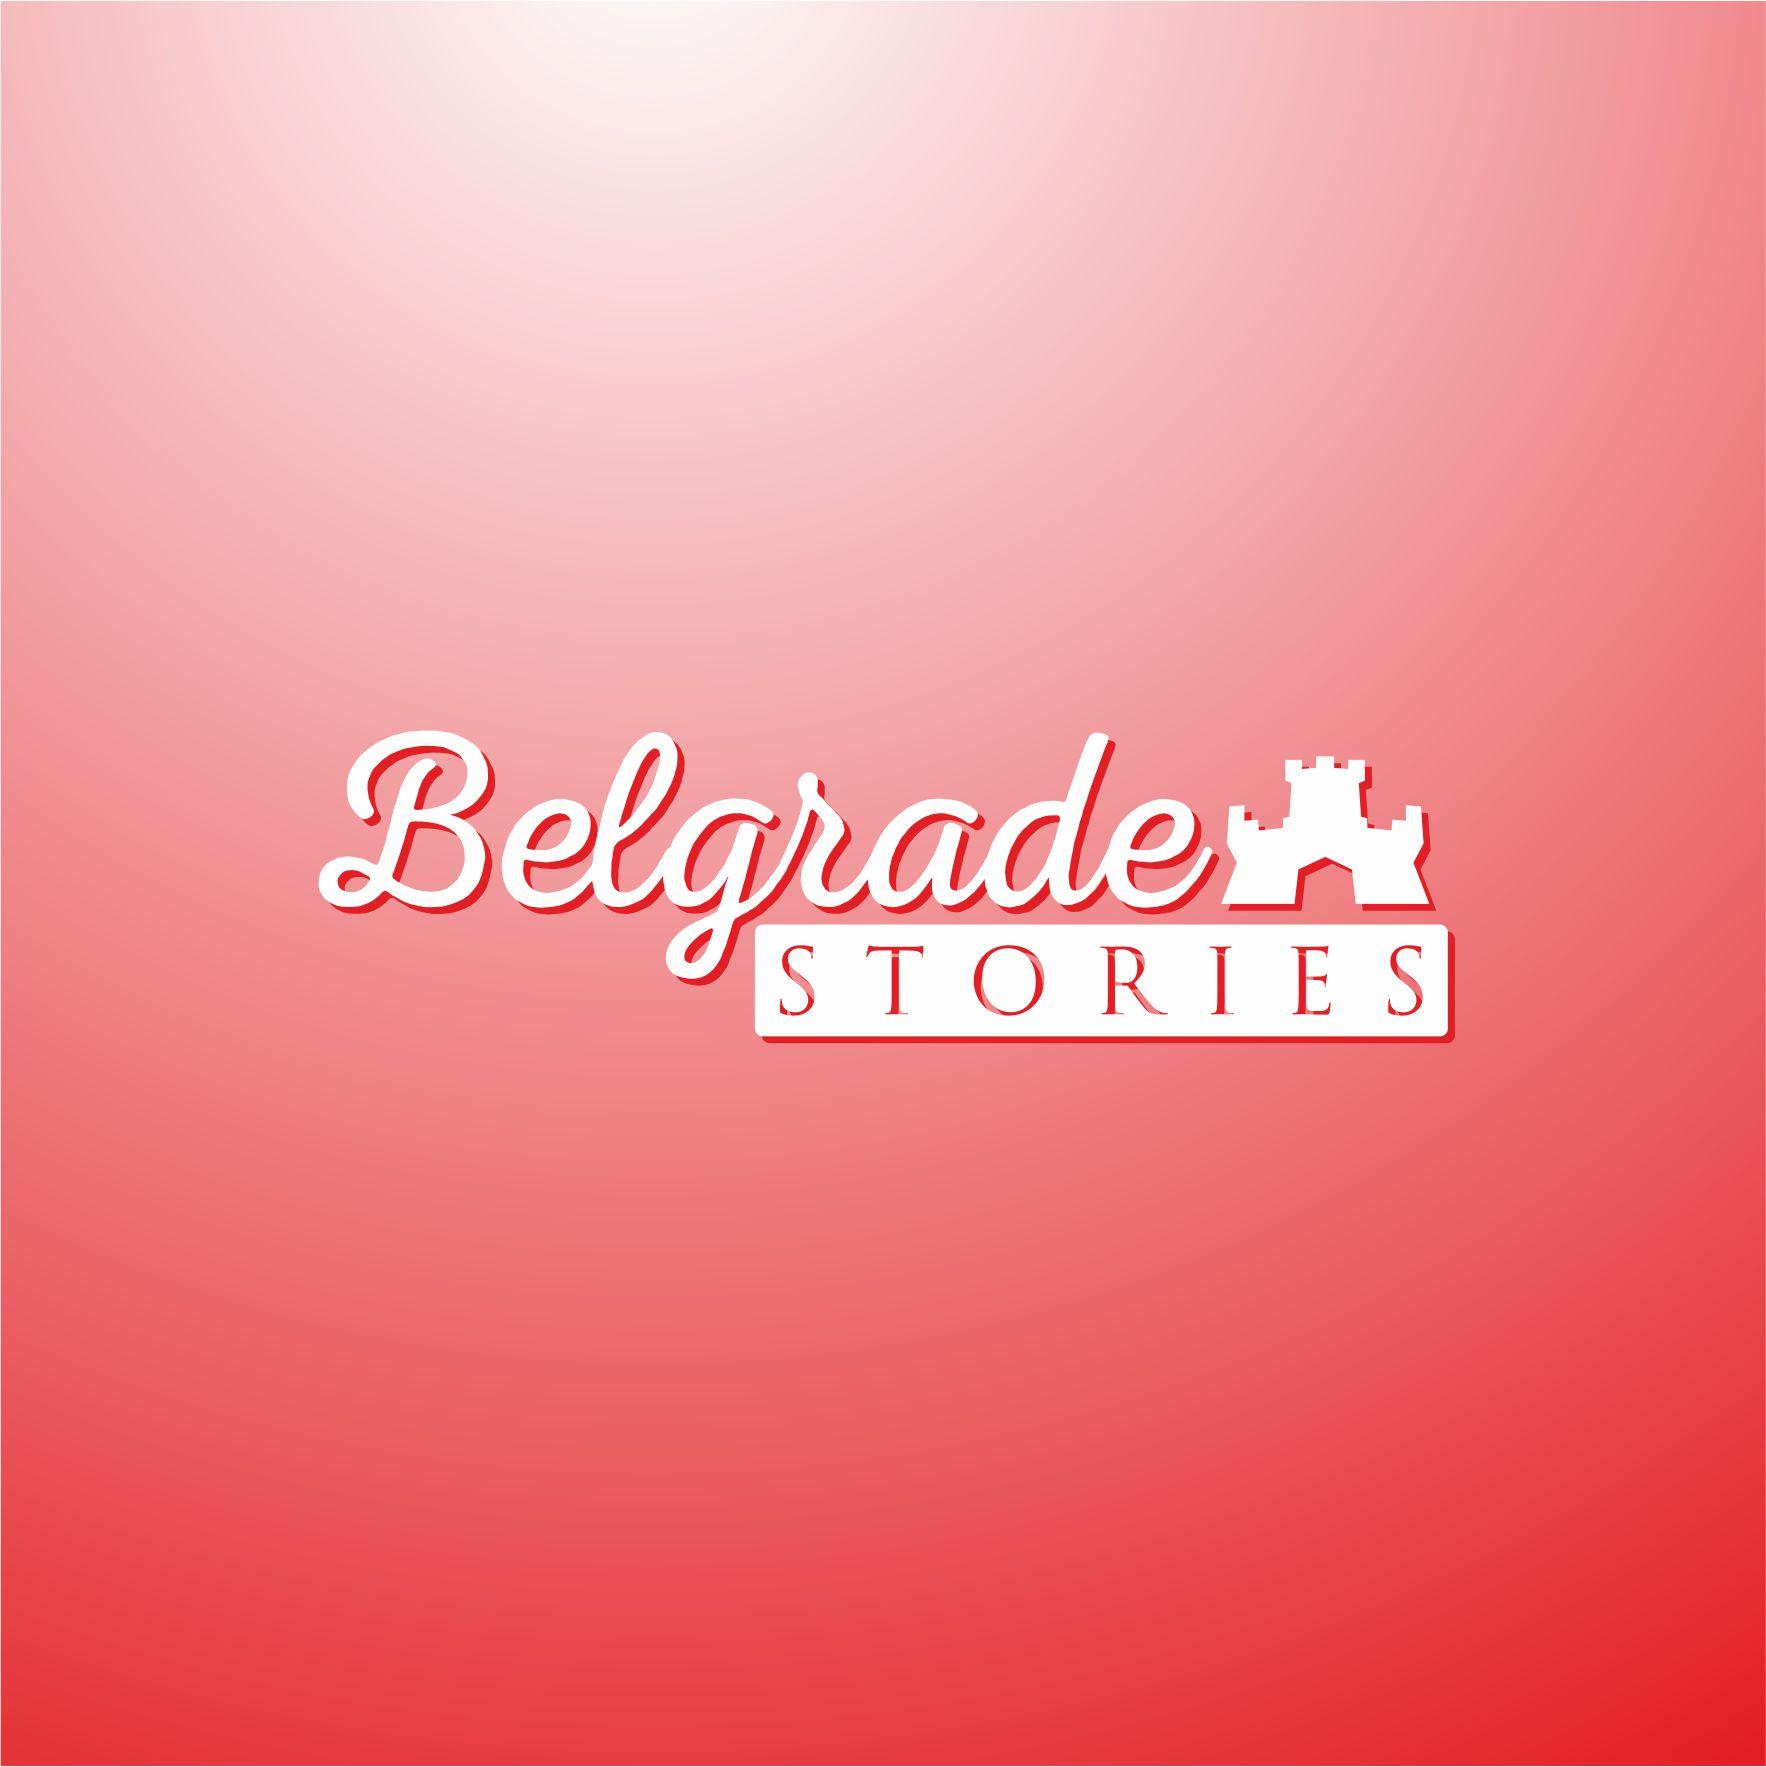 Логотип для агентства городских туров в Белграде фото f_04258933ab00a47b.jpg